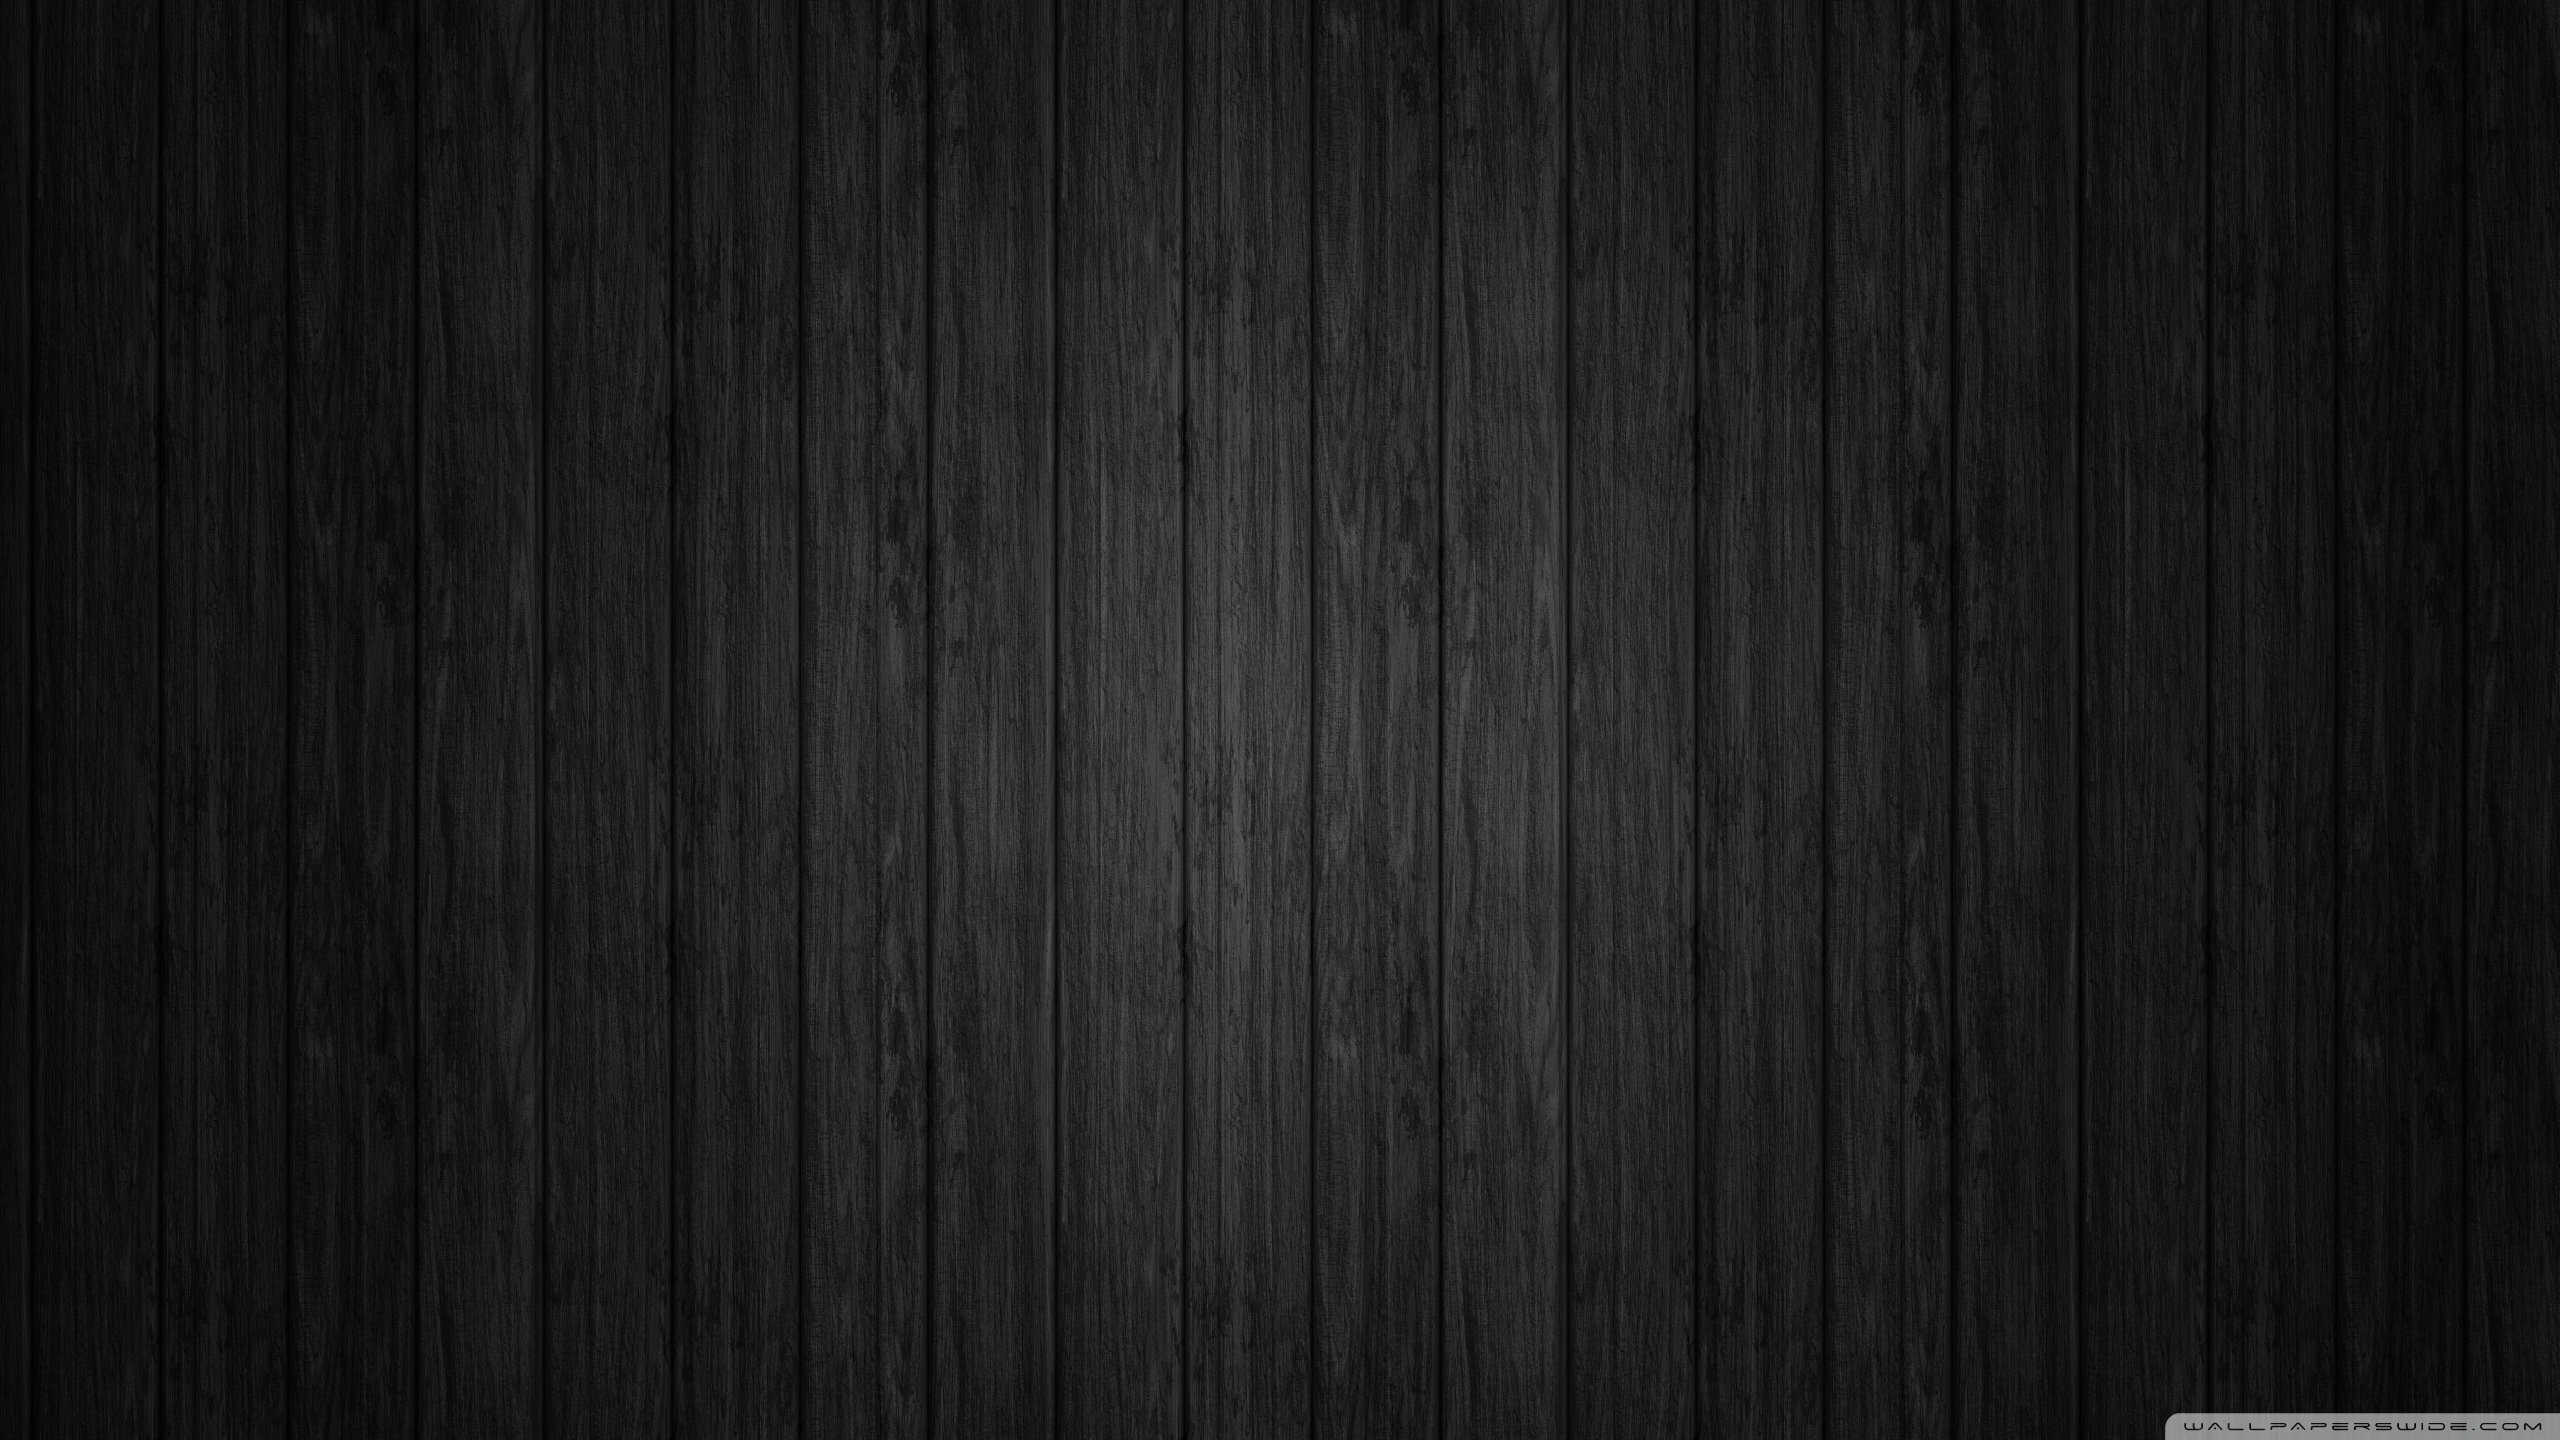 46 2560x1440 Black Wallpaper On Wallpapersafari